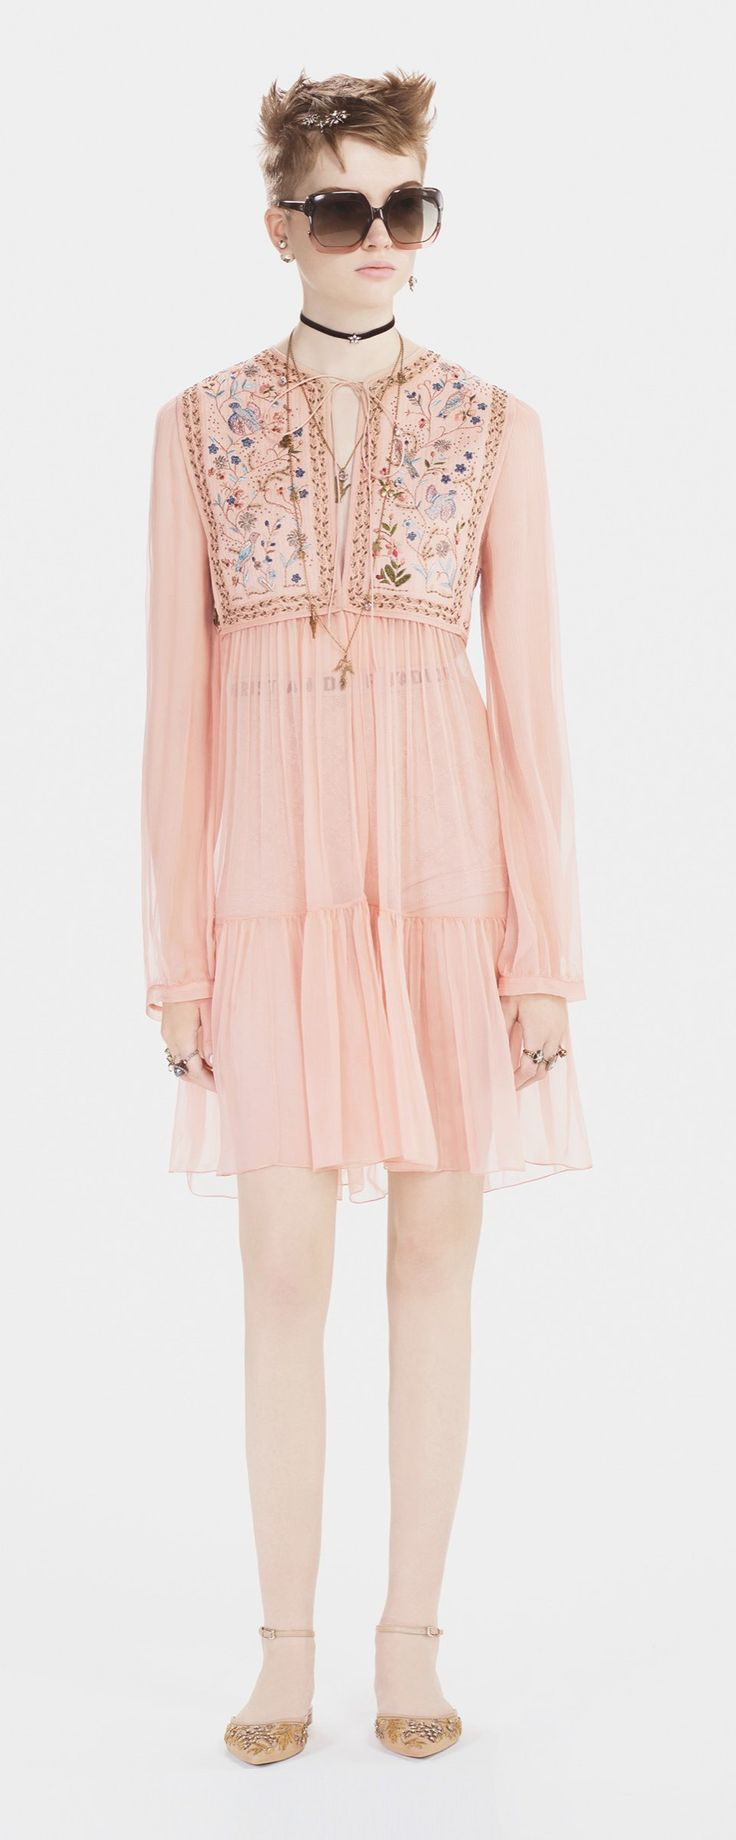 Christian Dior Fall 2017 - Ready-to-Wear - http://www.orientpalms.com/Dior-6516